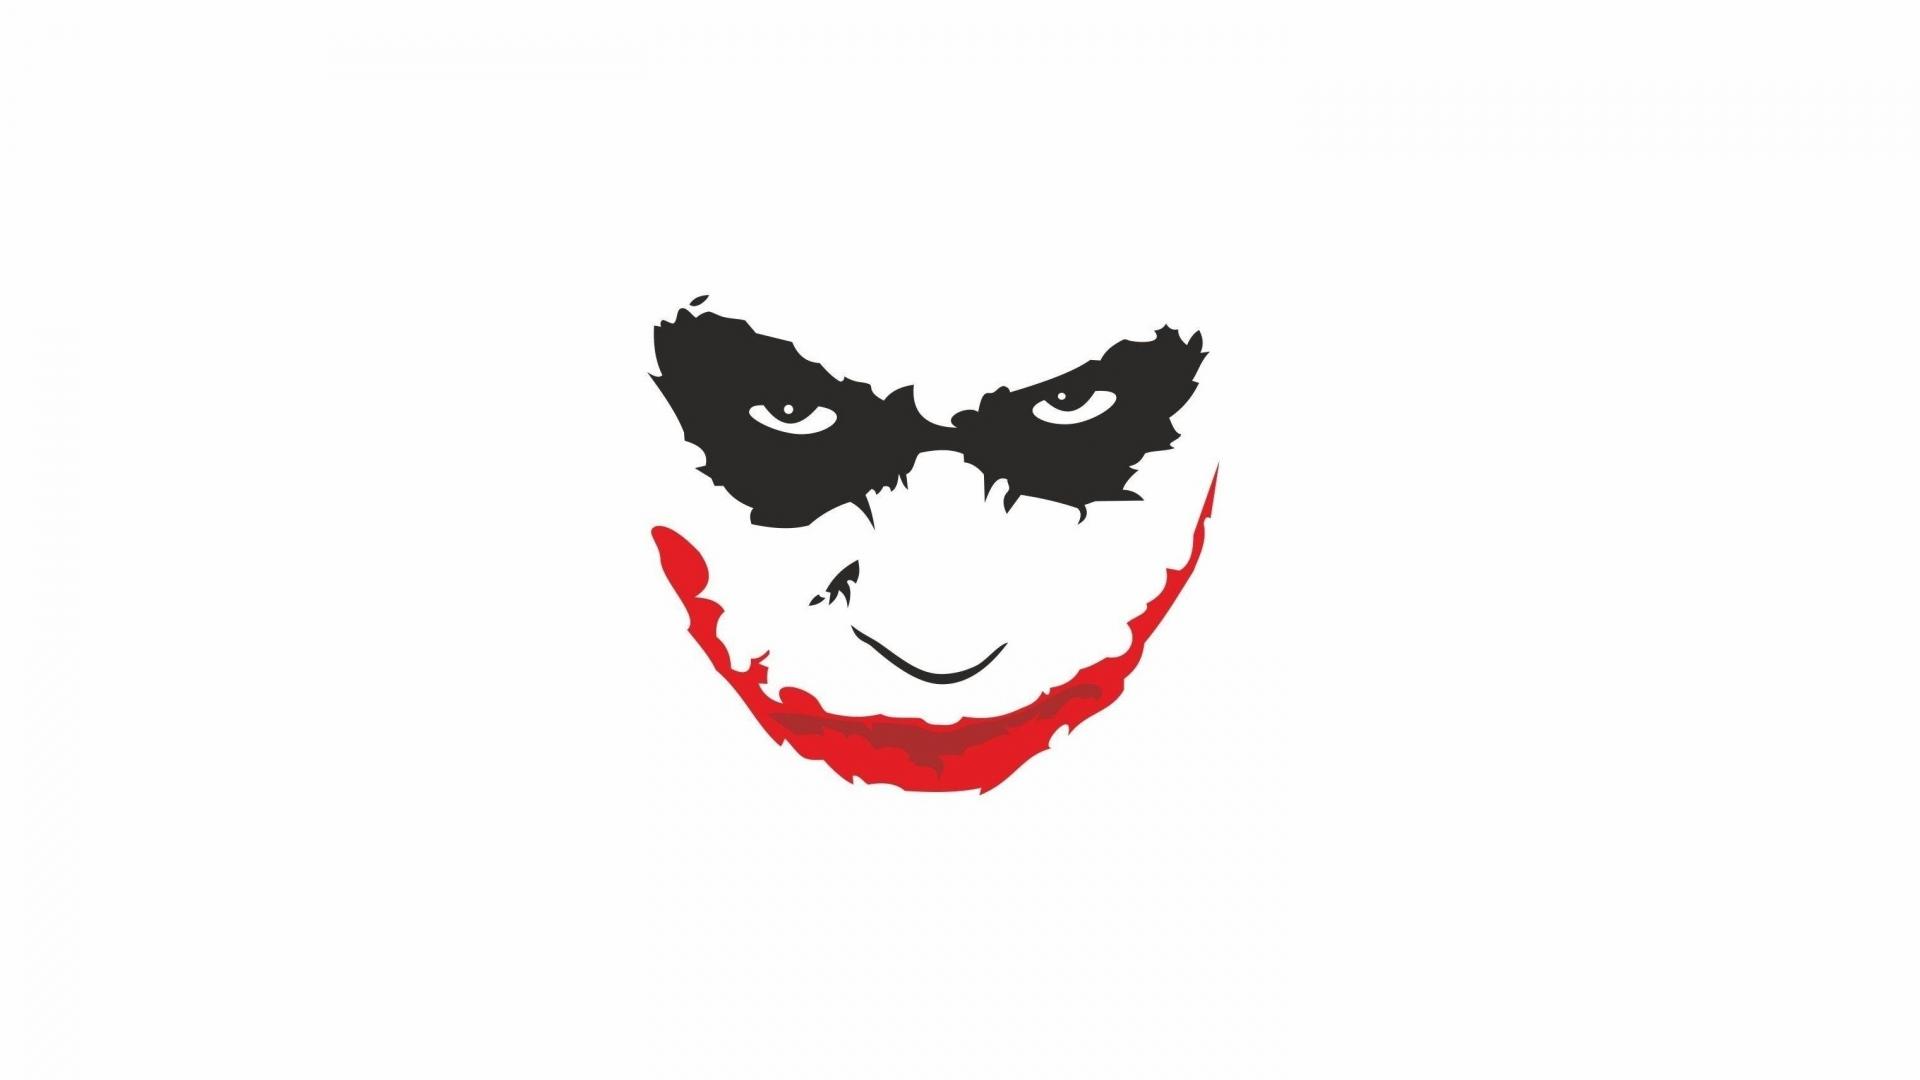 Download Wallpaper 1920x1080 Heath Ledger Smiling White